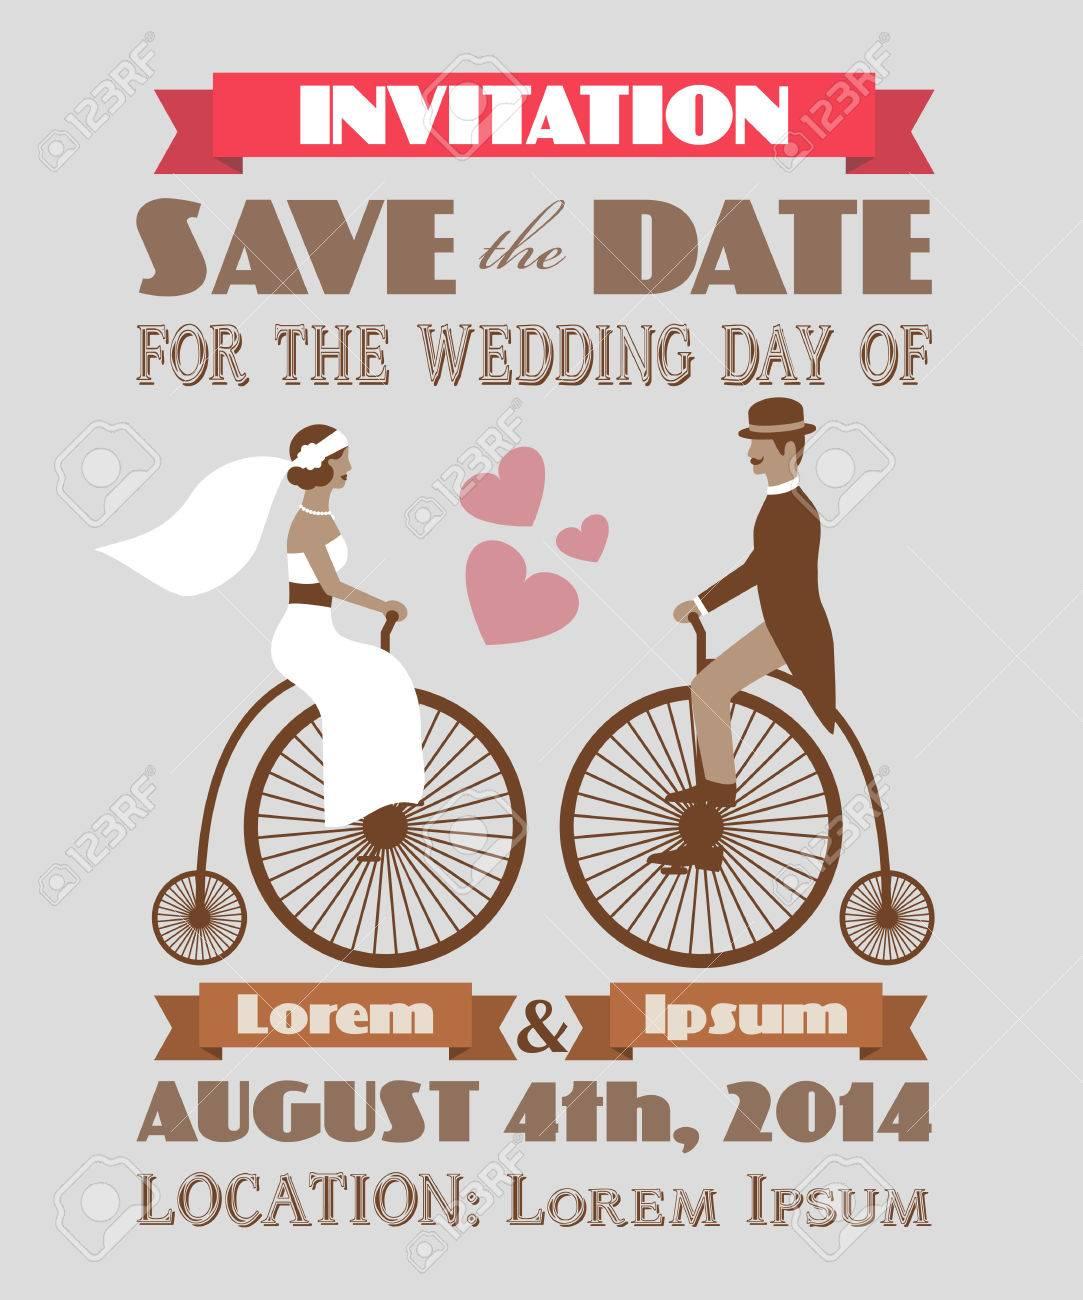 Vintage wedding invitation 2 Stock Vector - 22764297